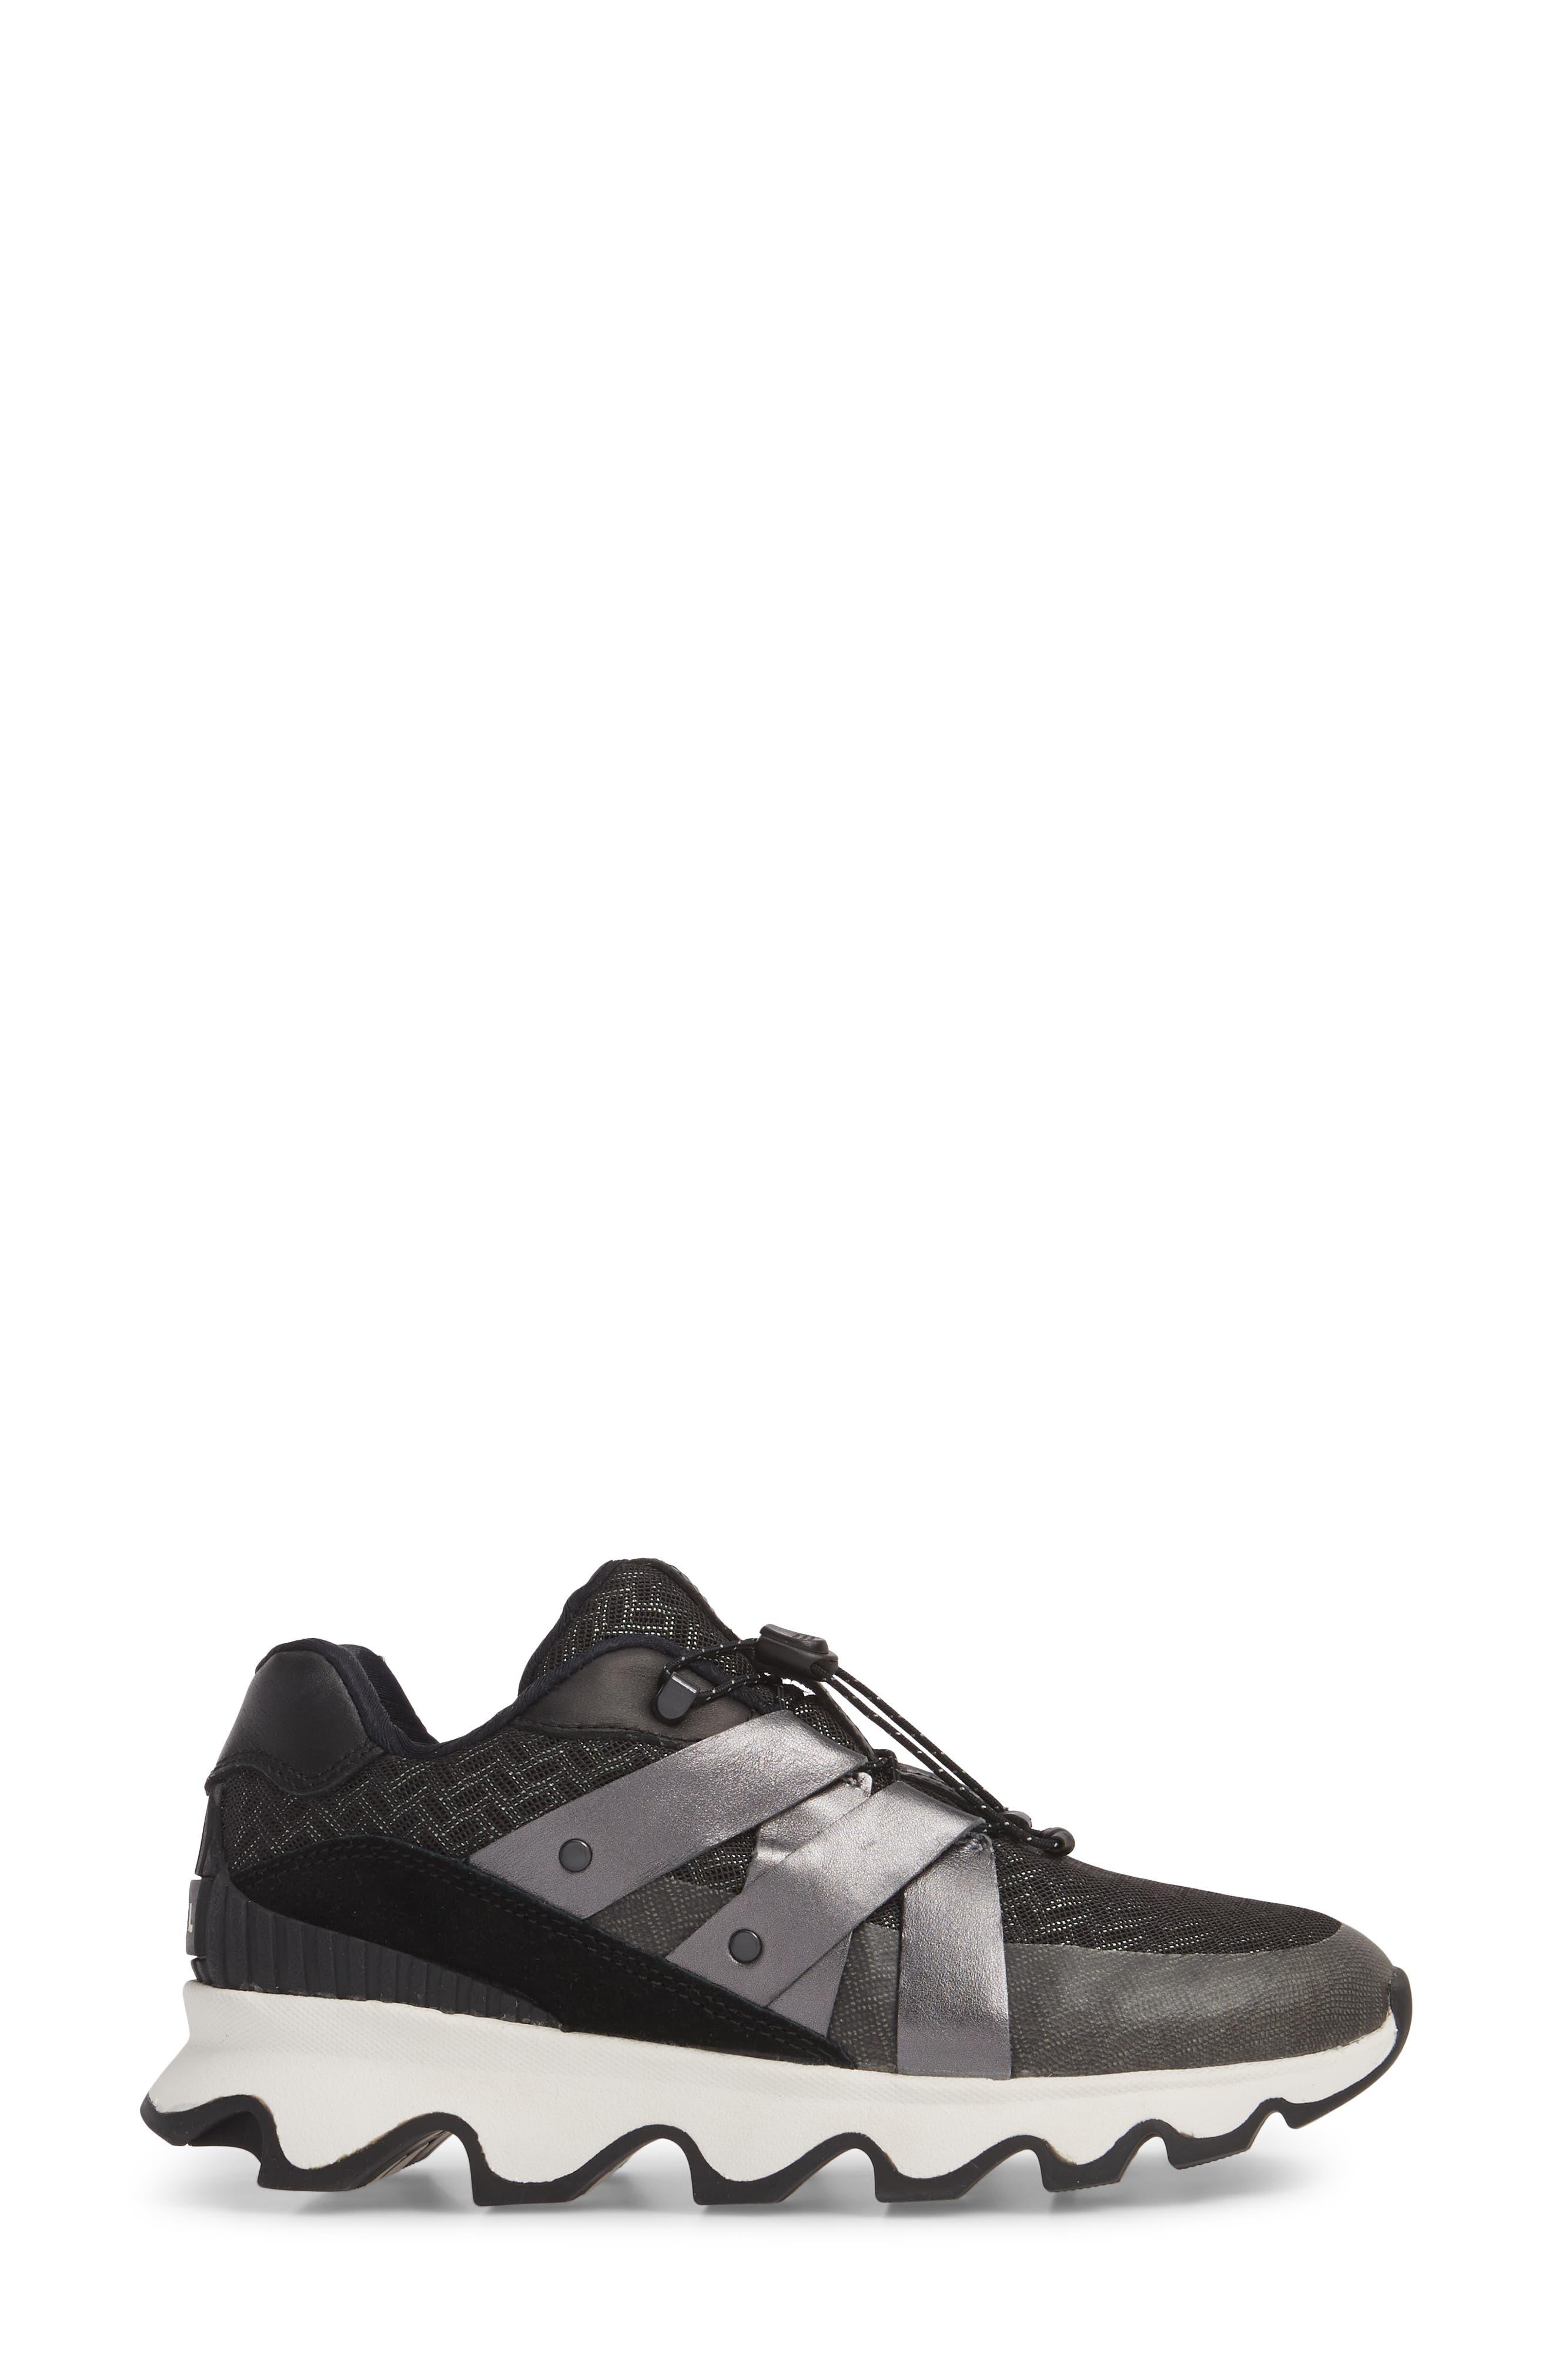 Kinetic Speed Sneaker,                             Alternate thumbnail 3, color,                             010